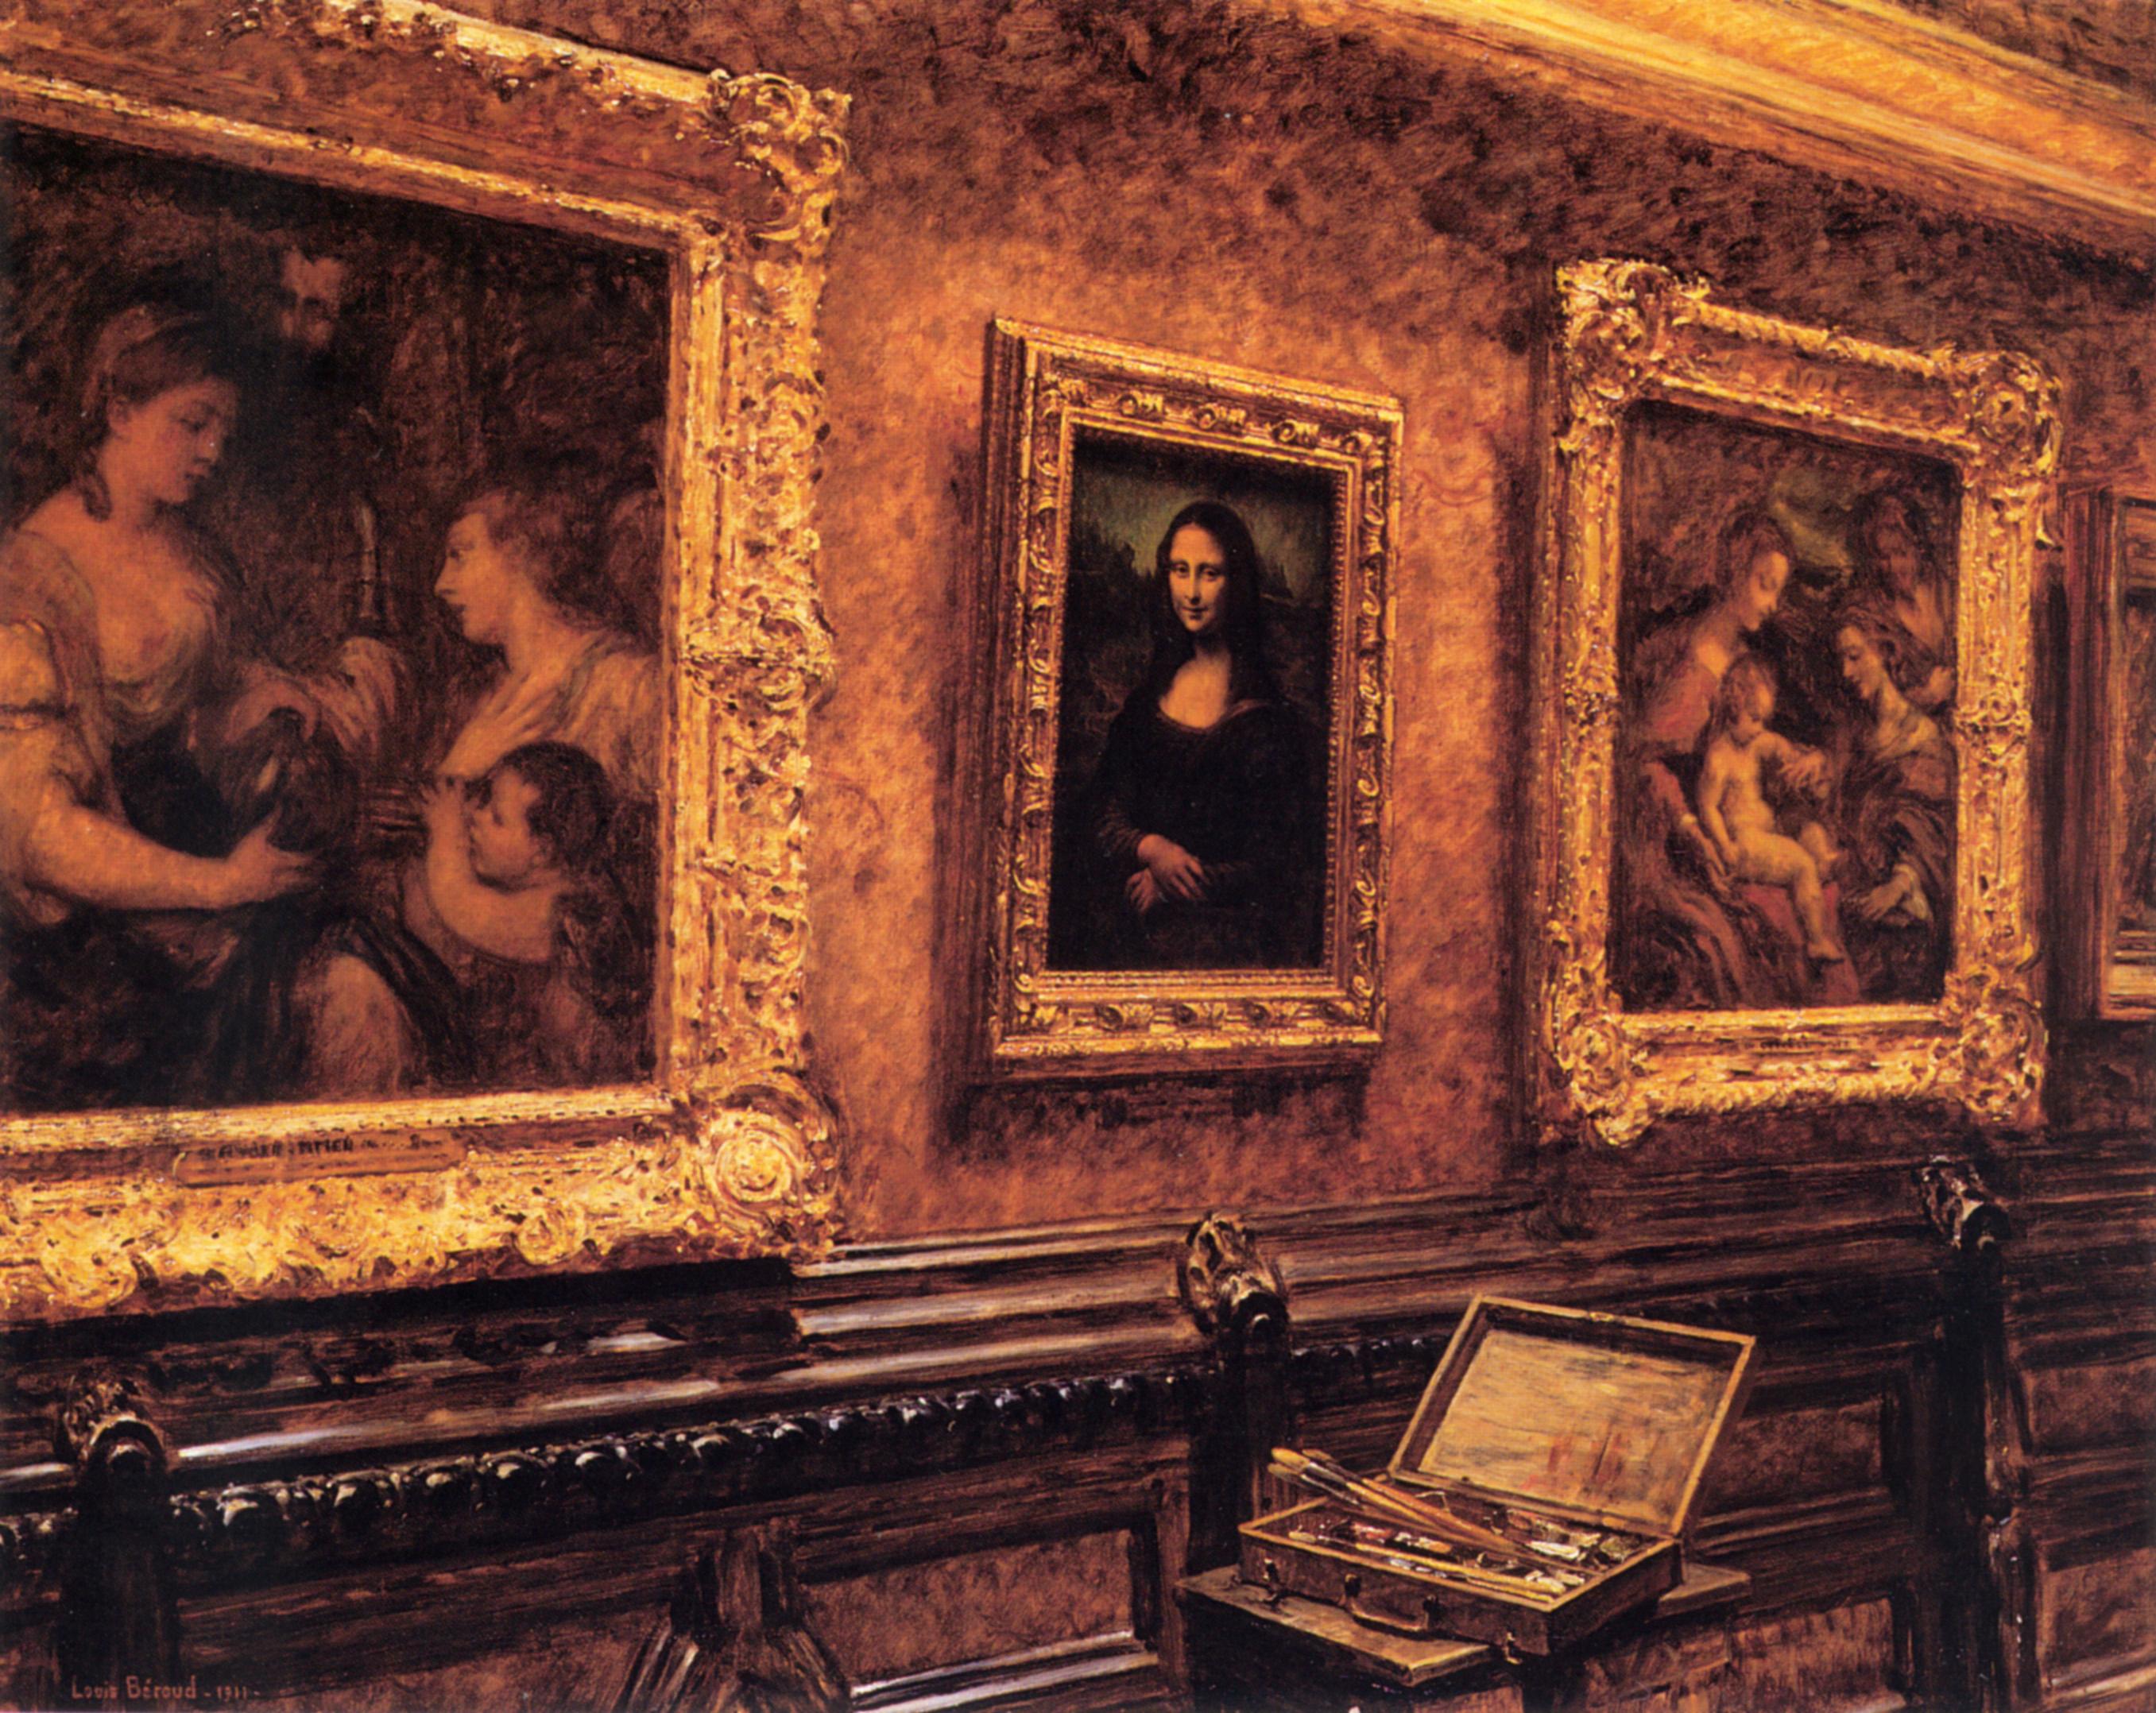 Beroud-L-Mona-Lisa-at-the-Louvre